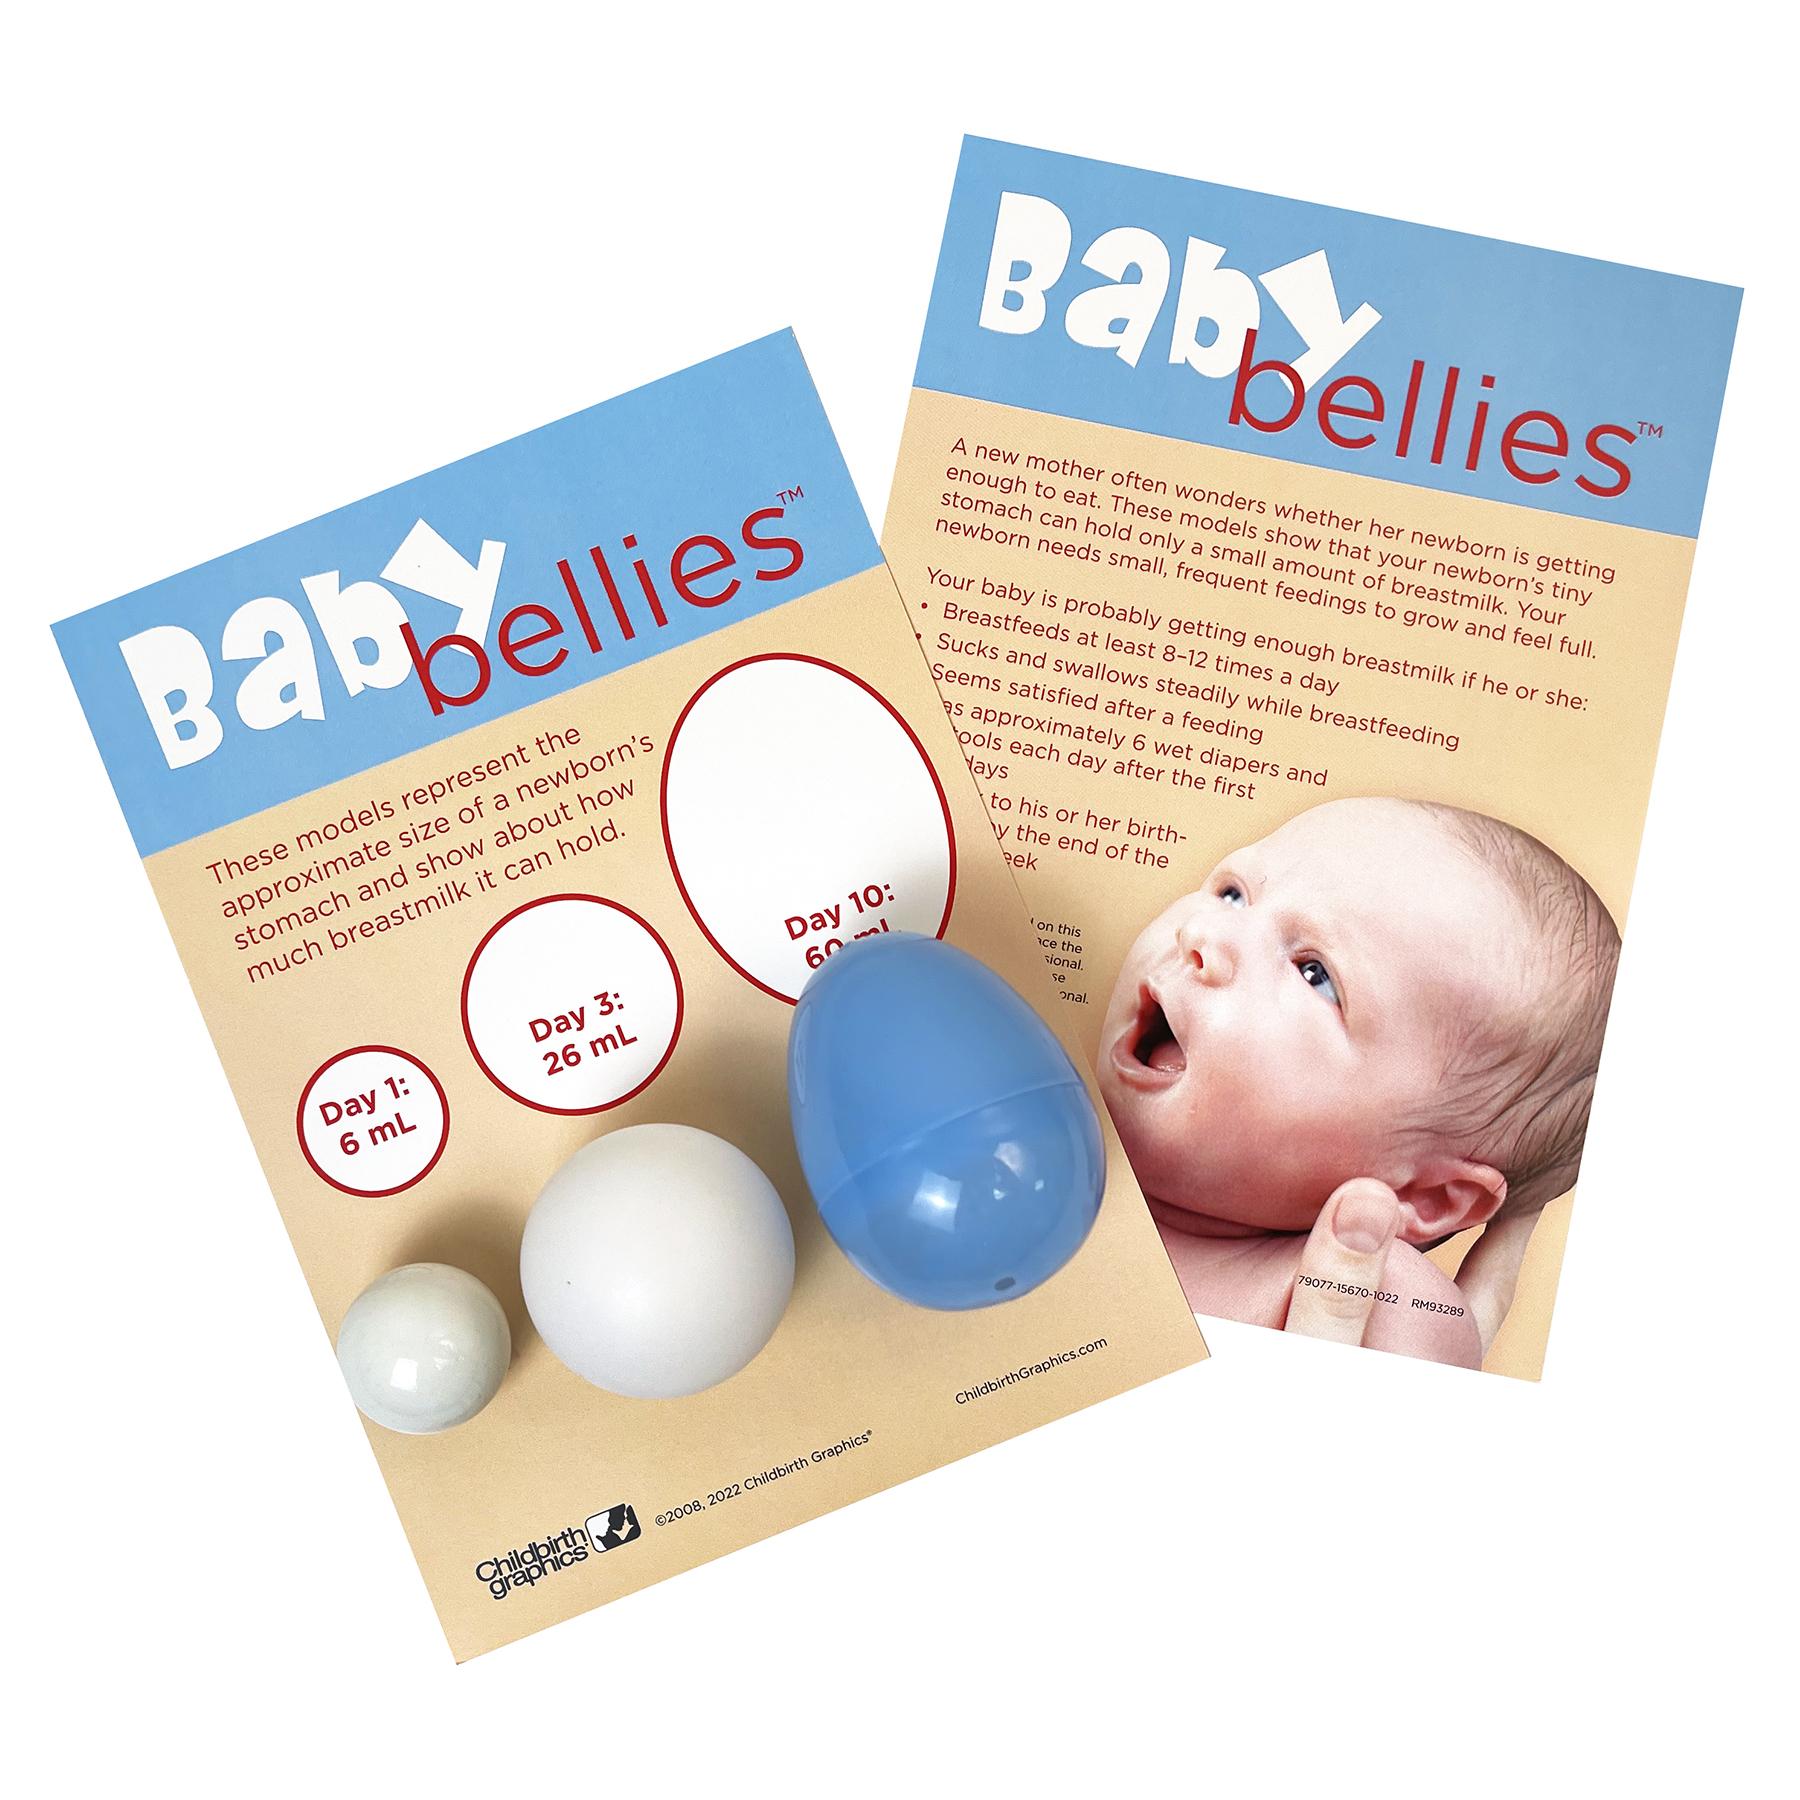 Baby Bellies Newborn Stomach Size Breastfeeding Education Display, childbirth education materials, Childbirth Graphics, 79077